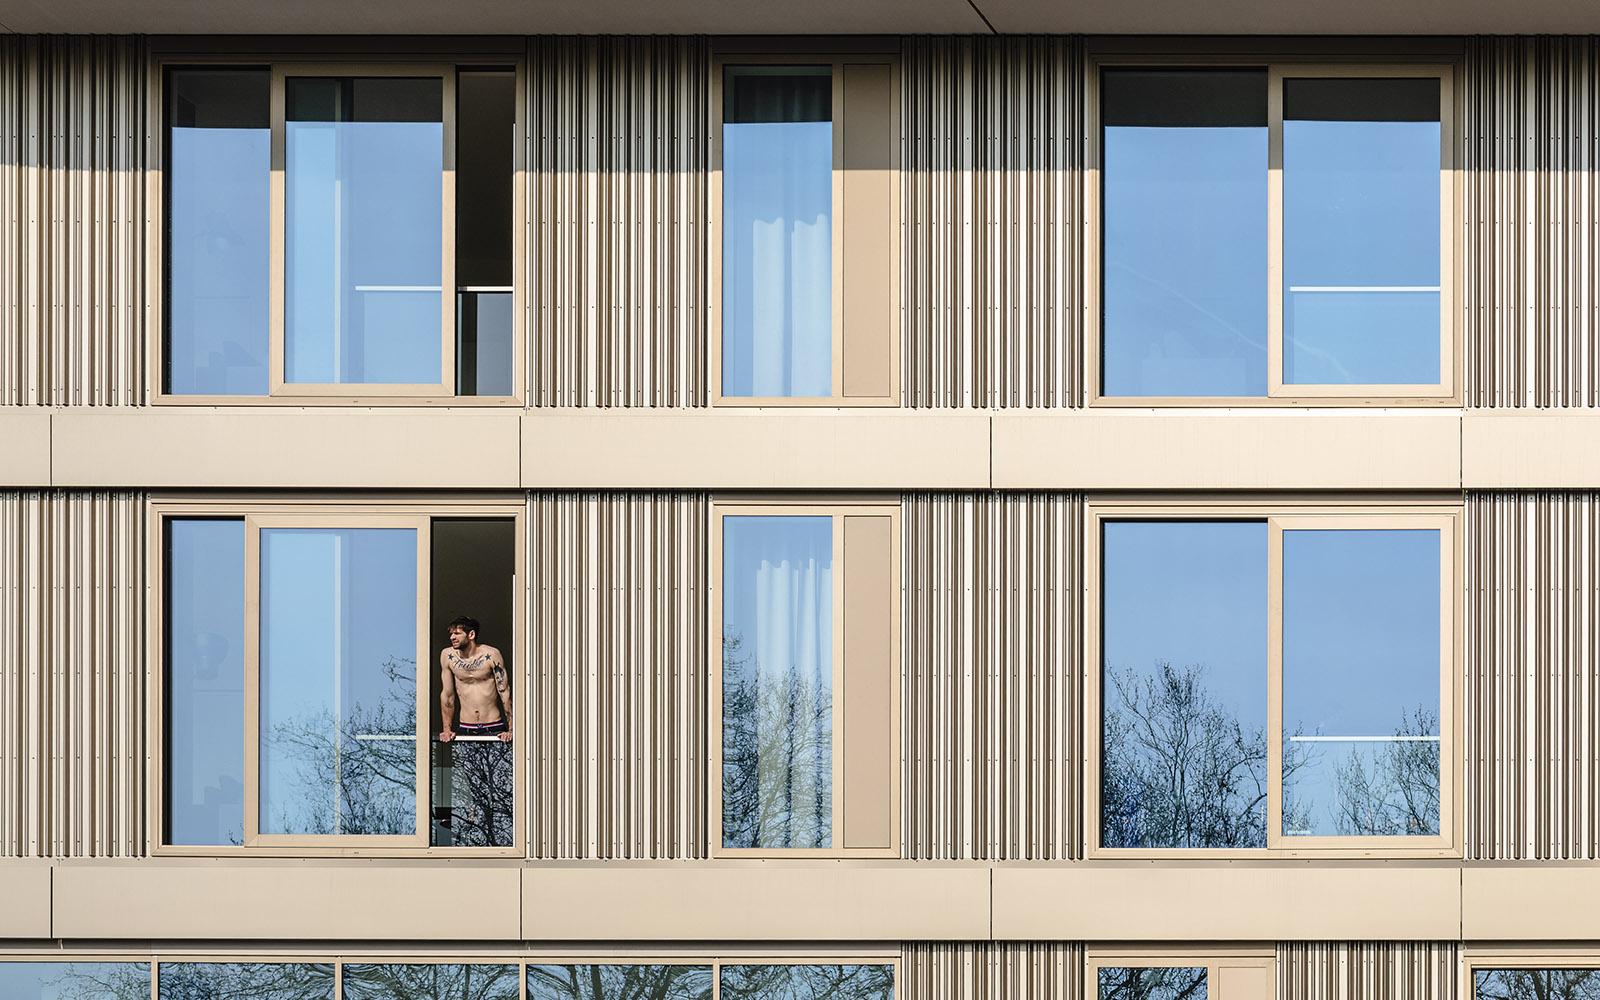 TD gebouw, fotograaf BasePhotography